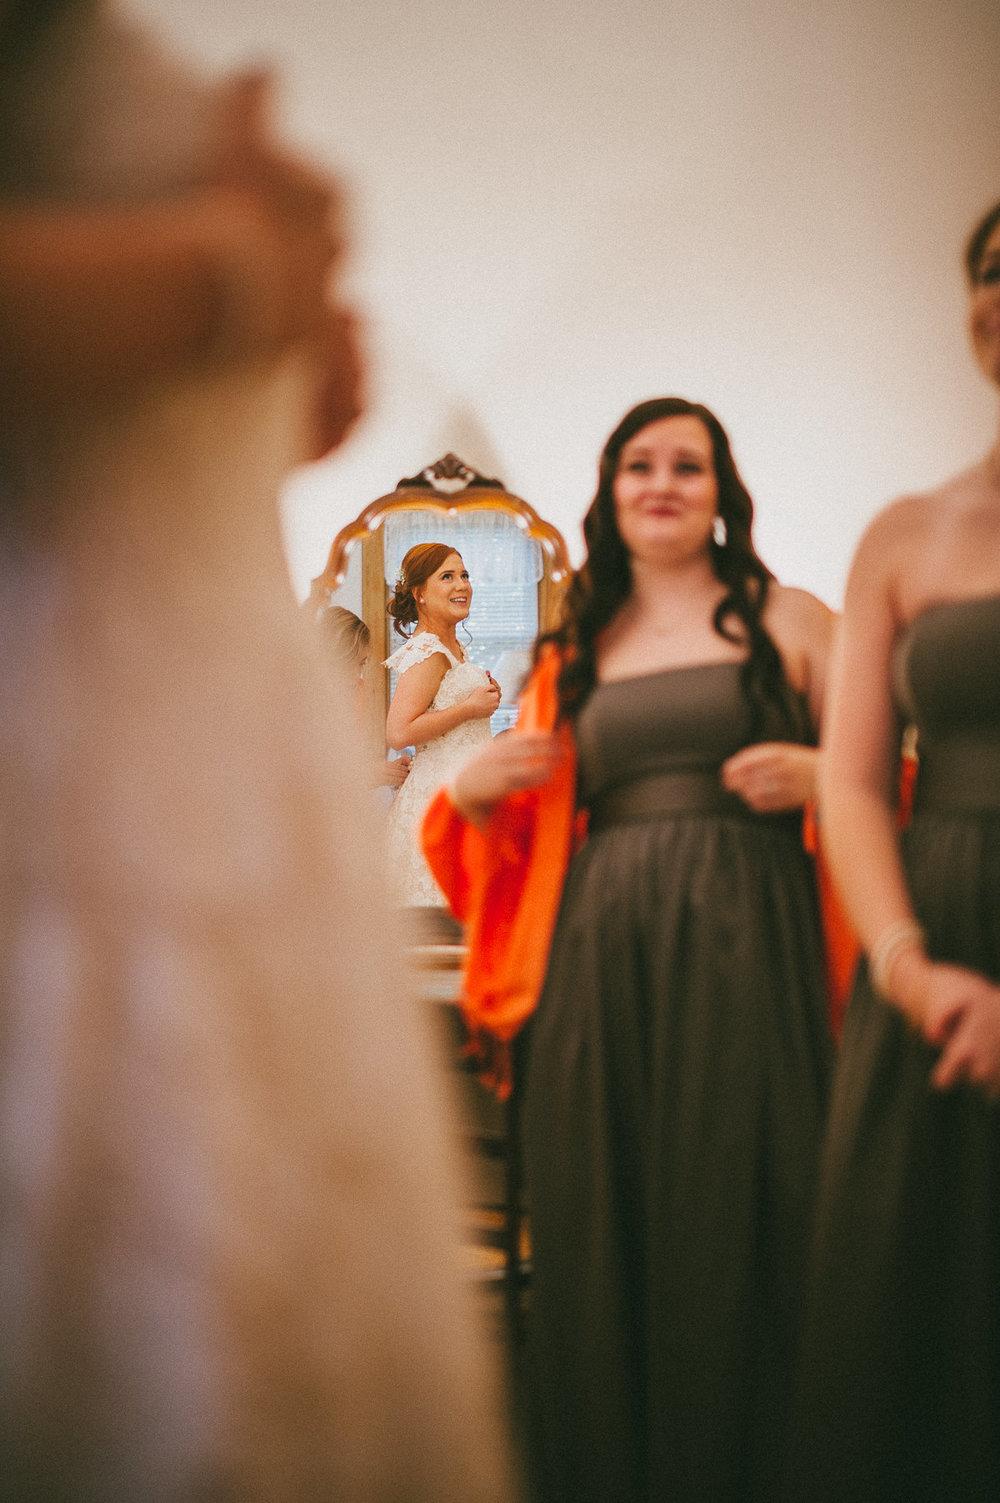 breighton-and-basette-photography-copyrighted-image-blog-amanda-and-eric-wedding-053.jpg